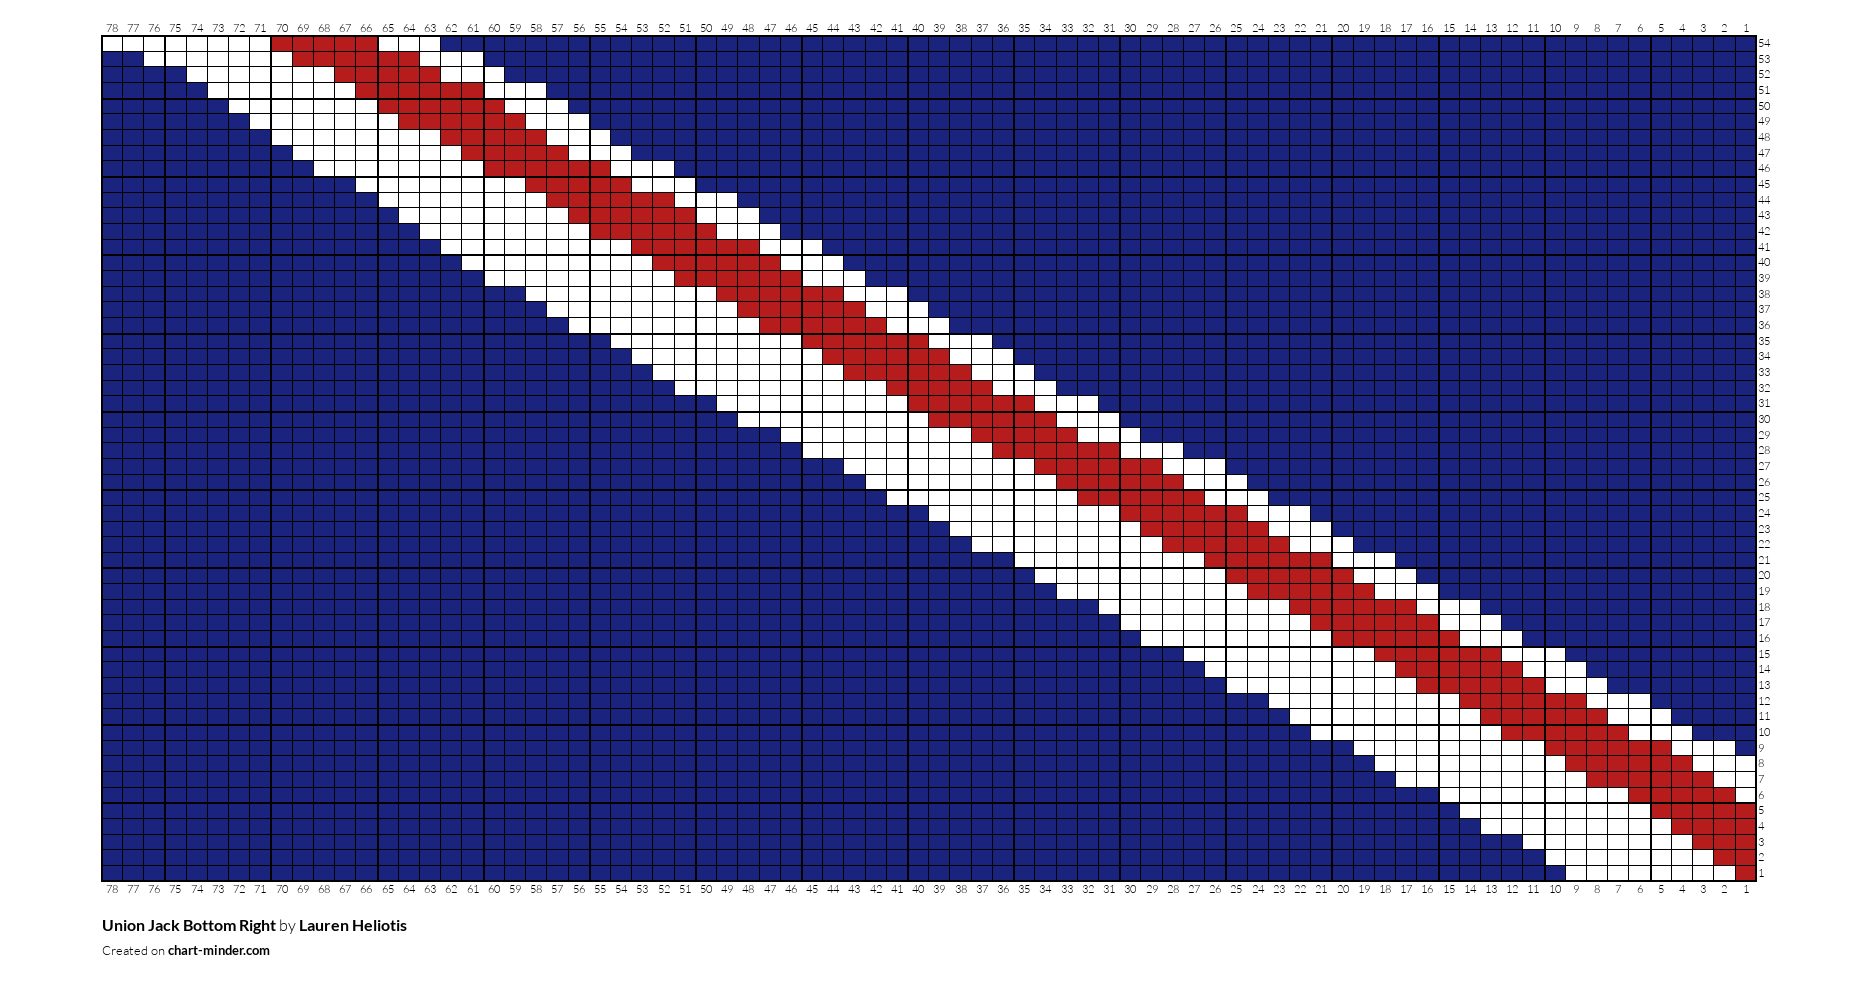 Union Jack Bottom Right